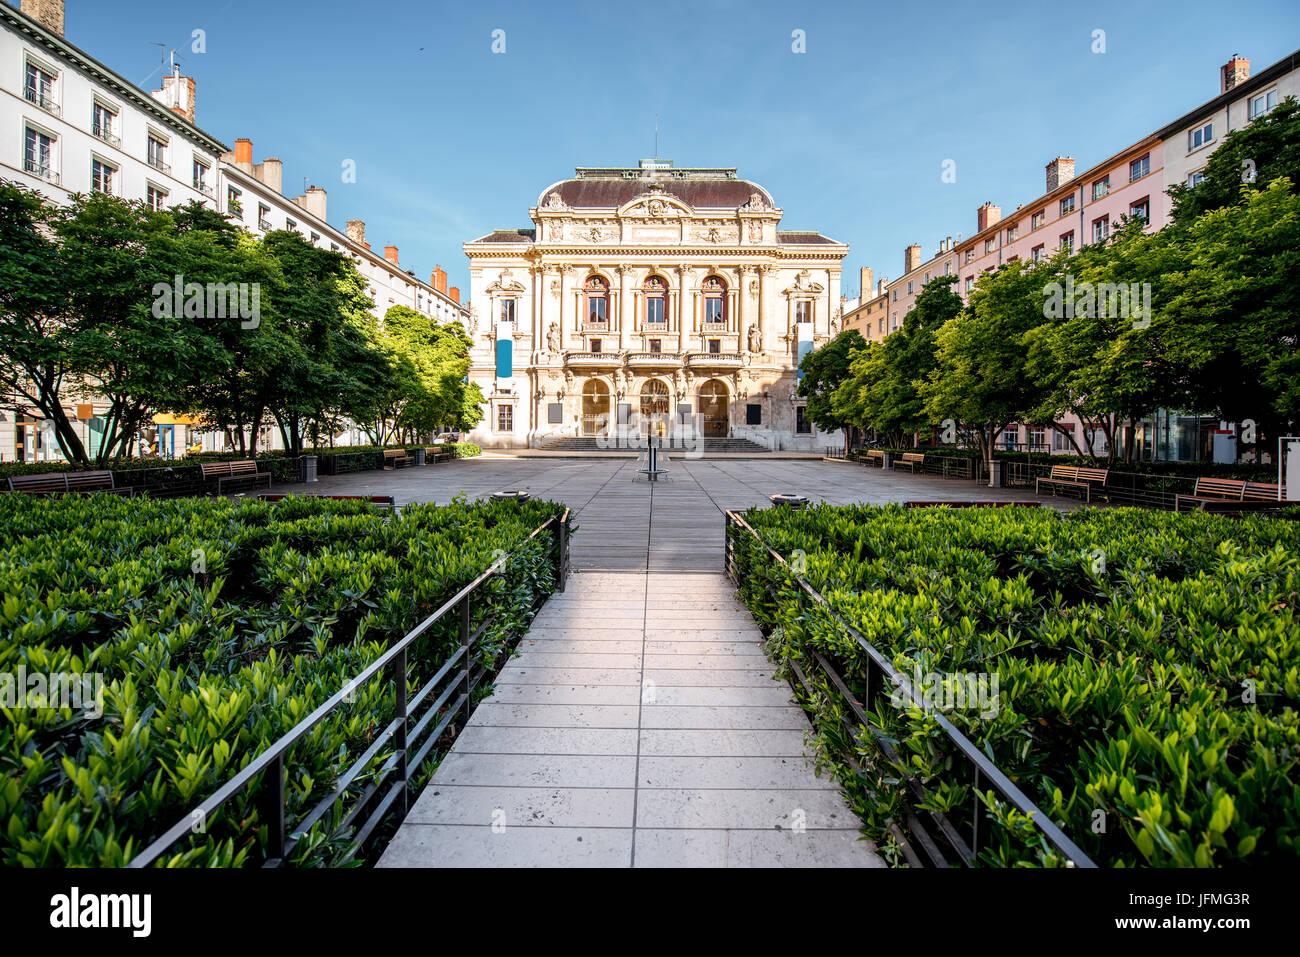 Lyon city in France - Stock Image